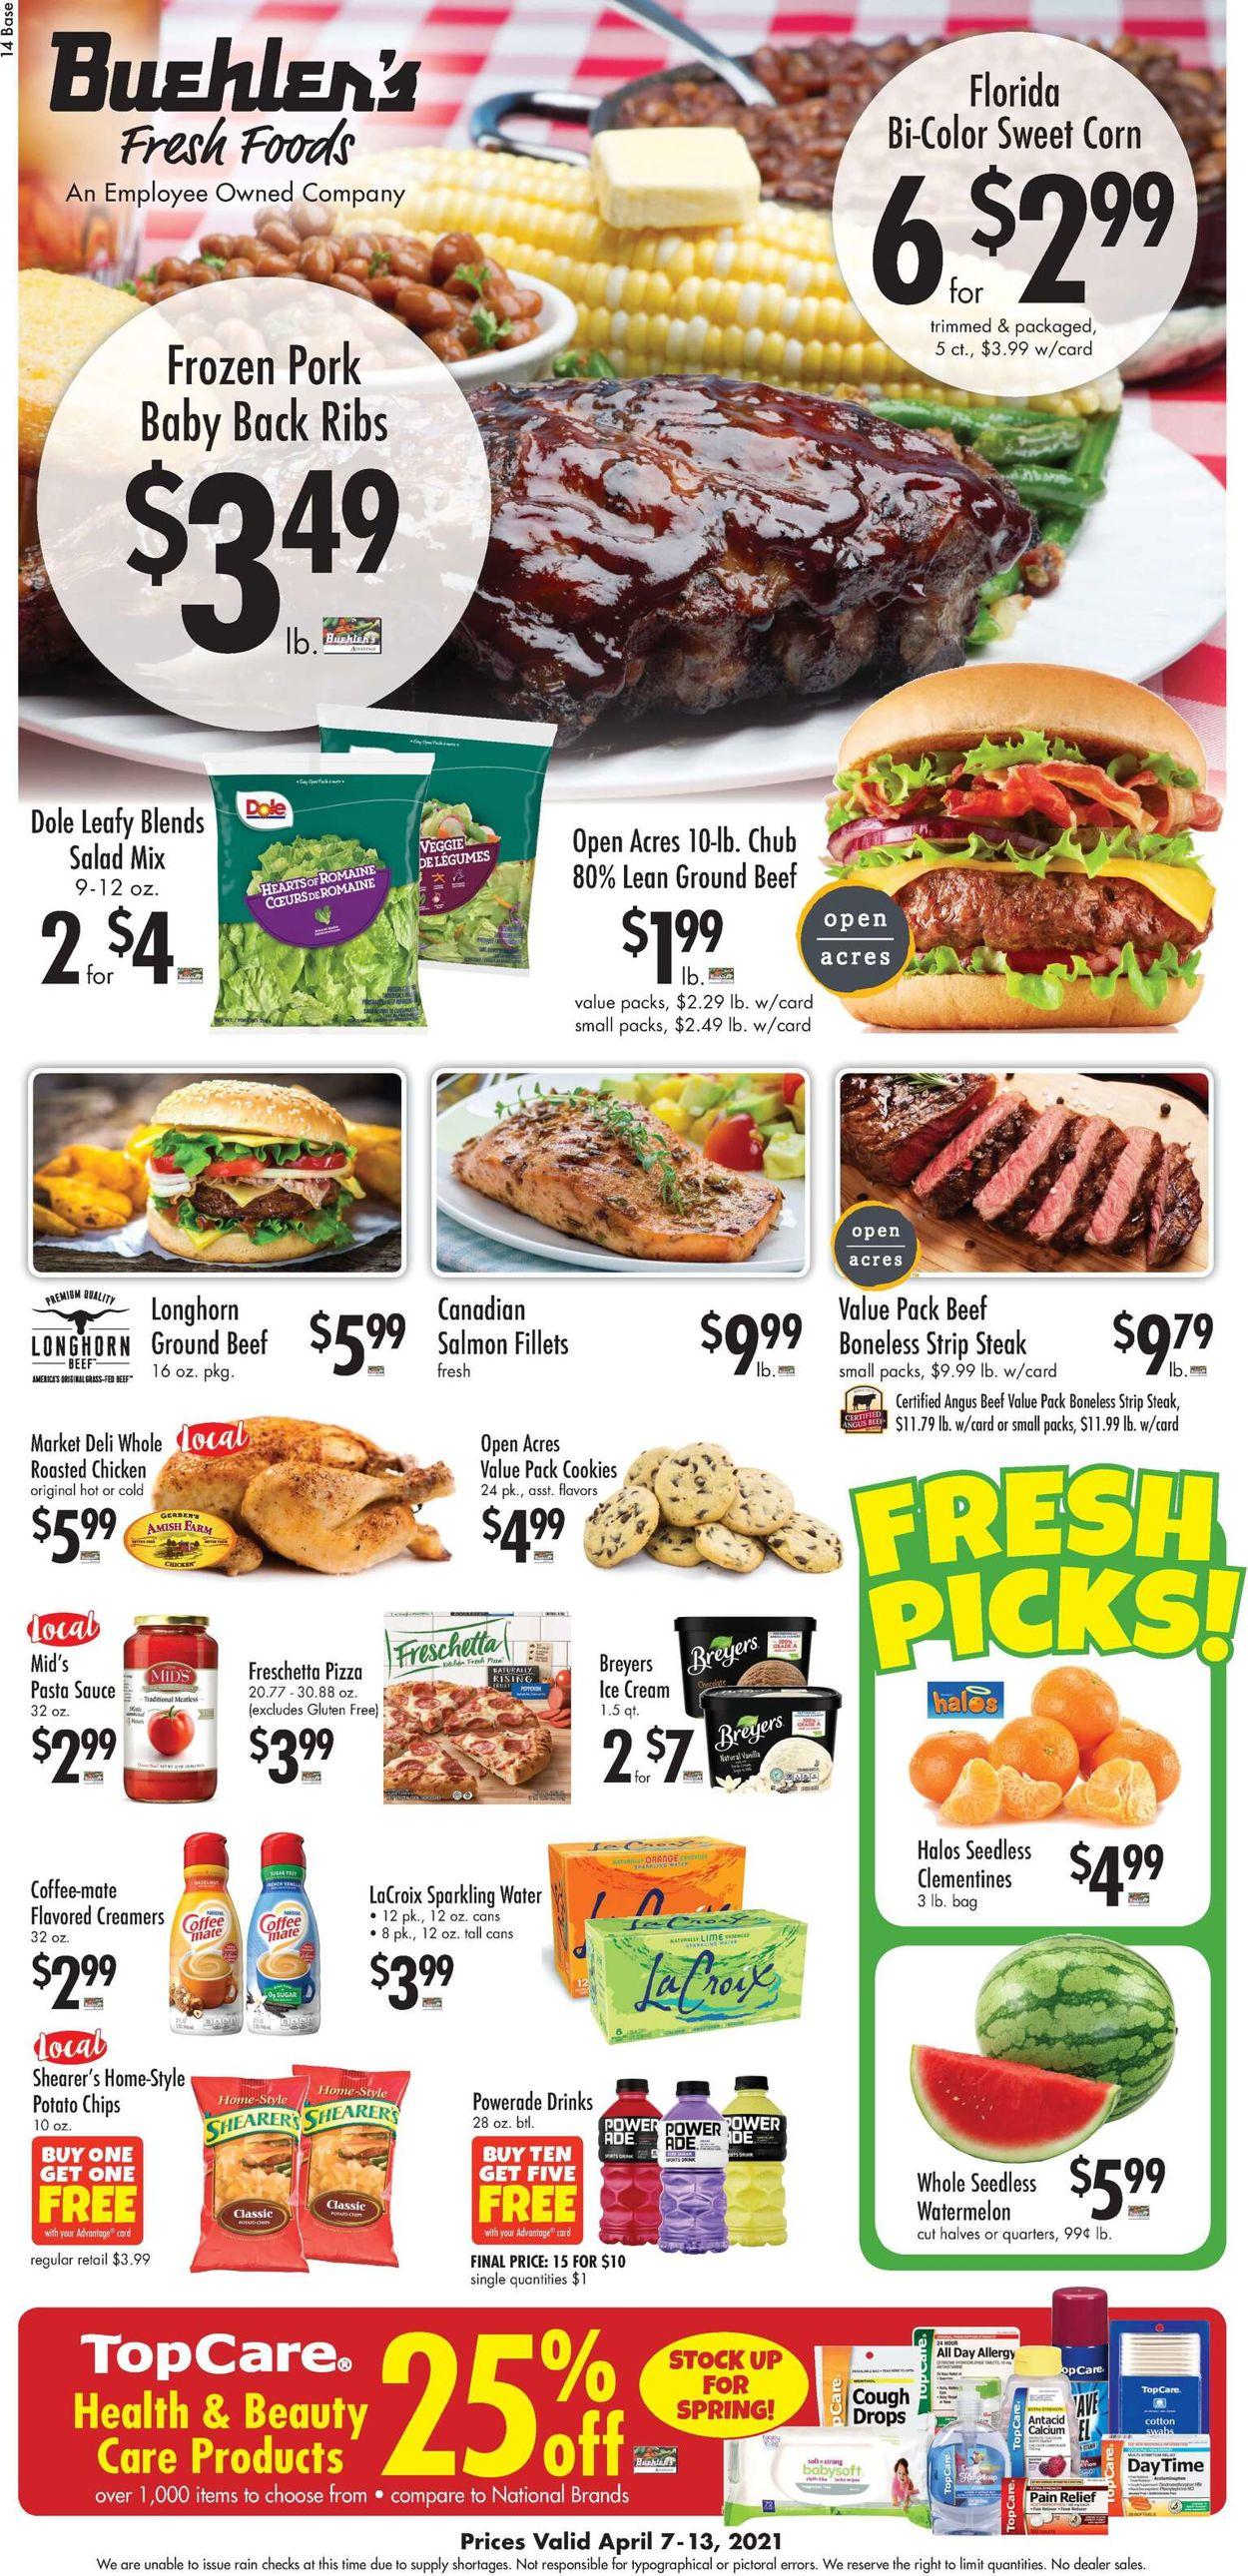 Buehler's Fresh Foods Weekly Ad Circular - valid 04/07-04/13/2021